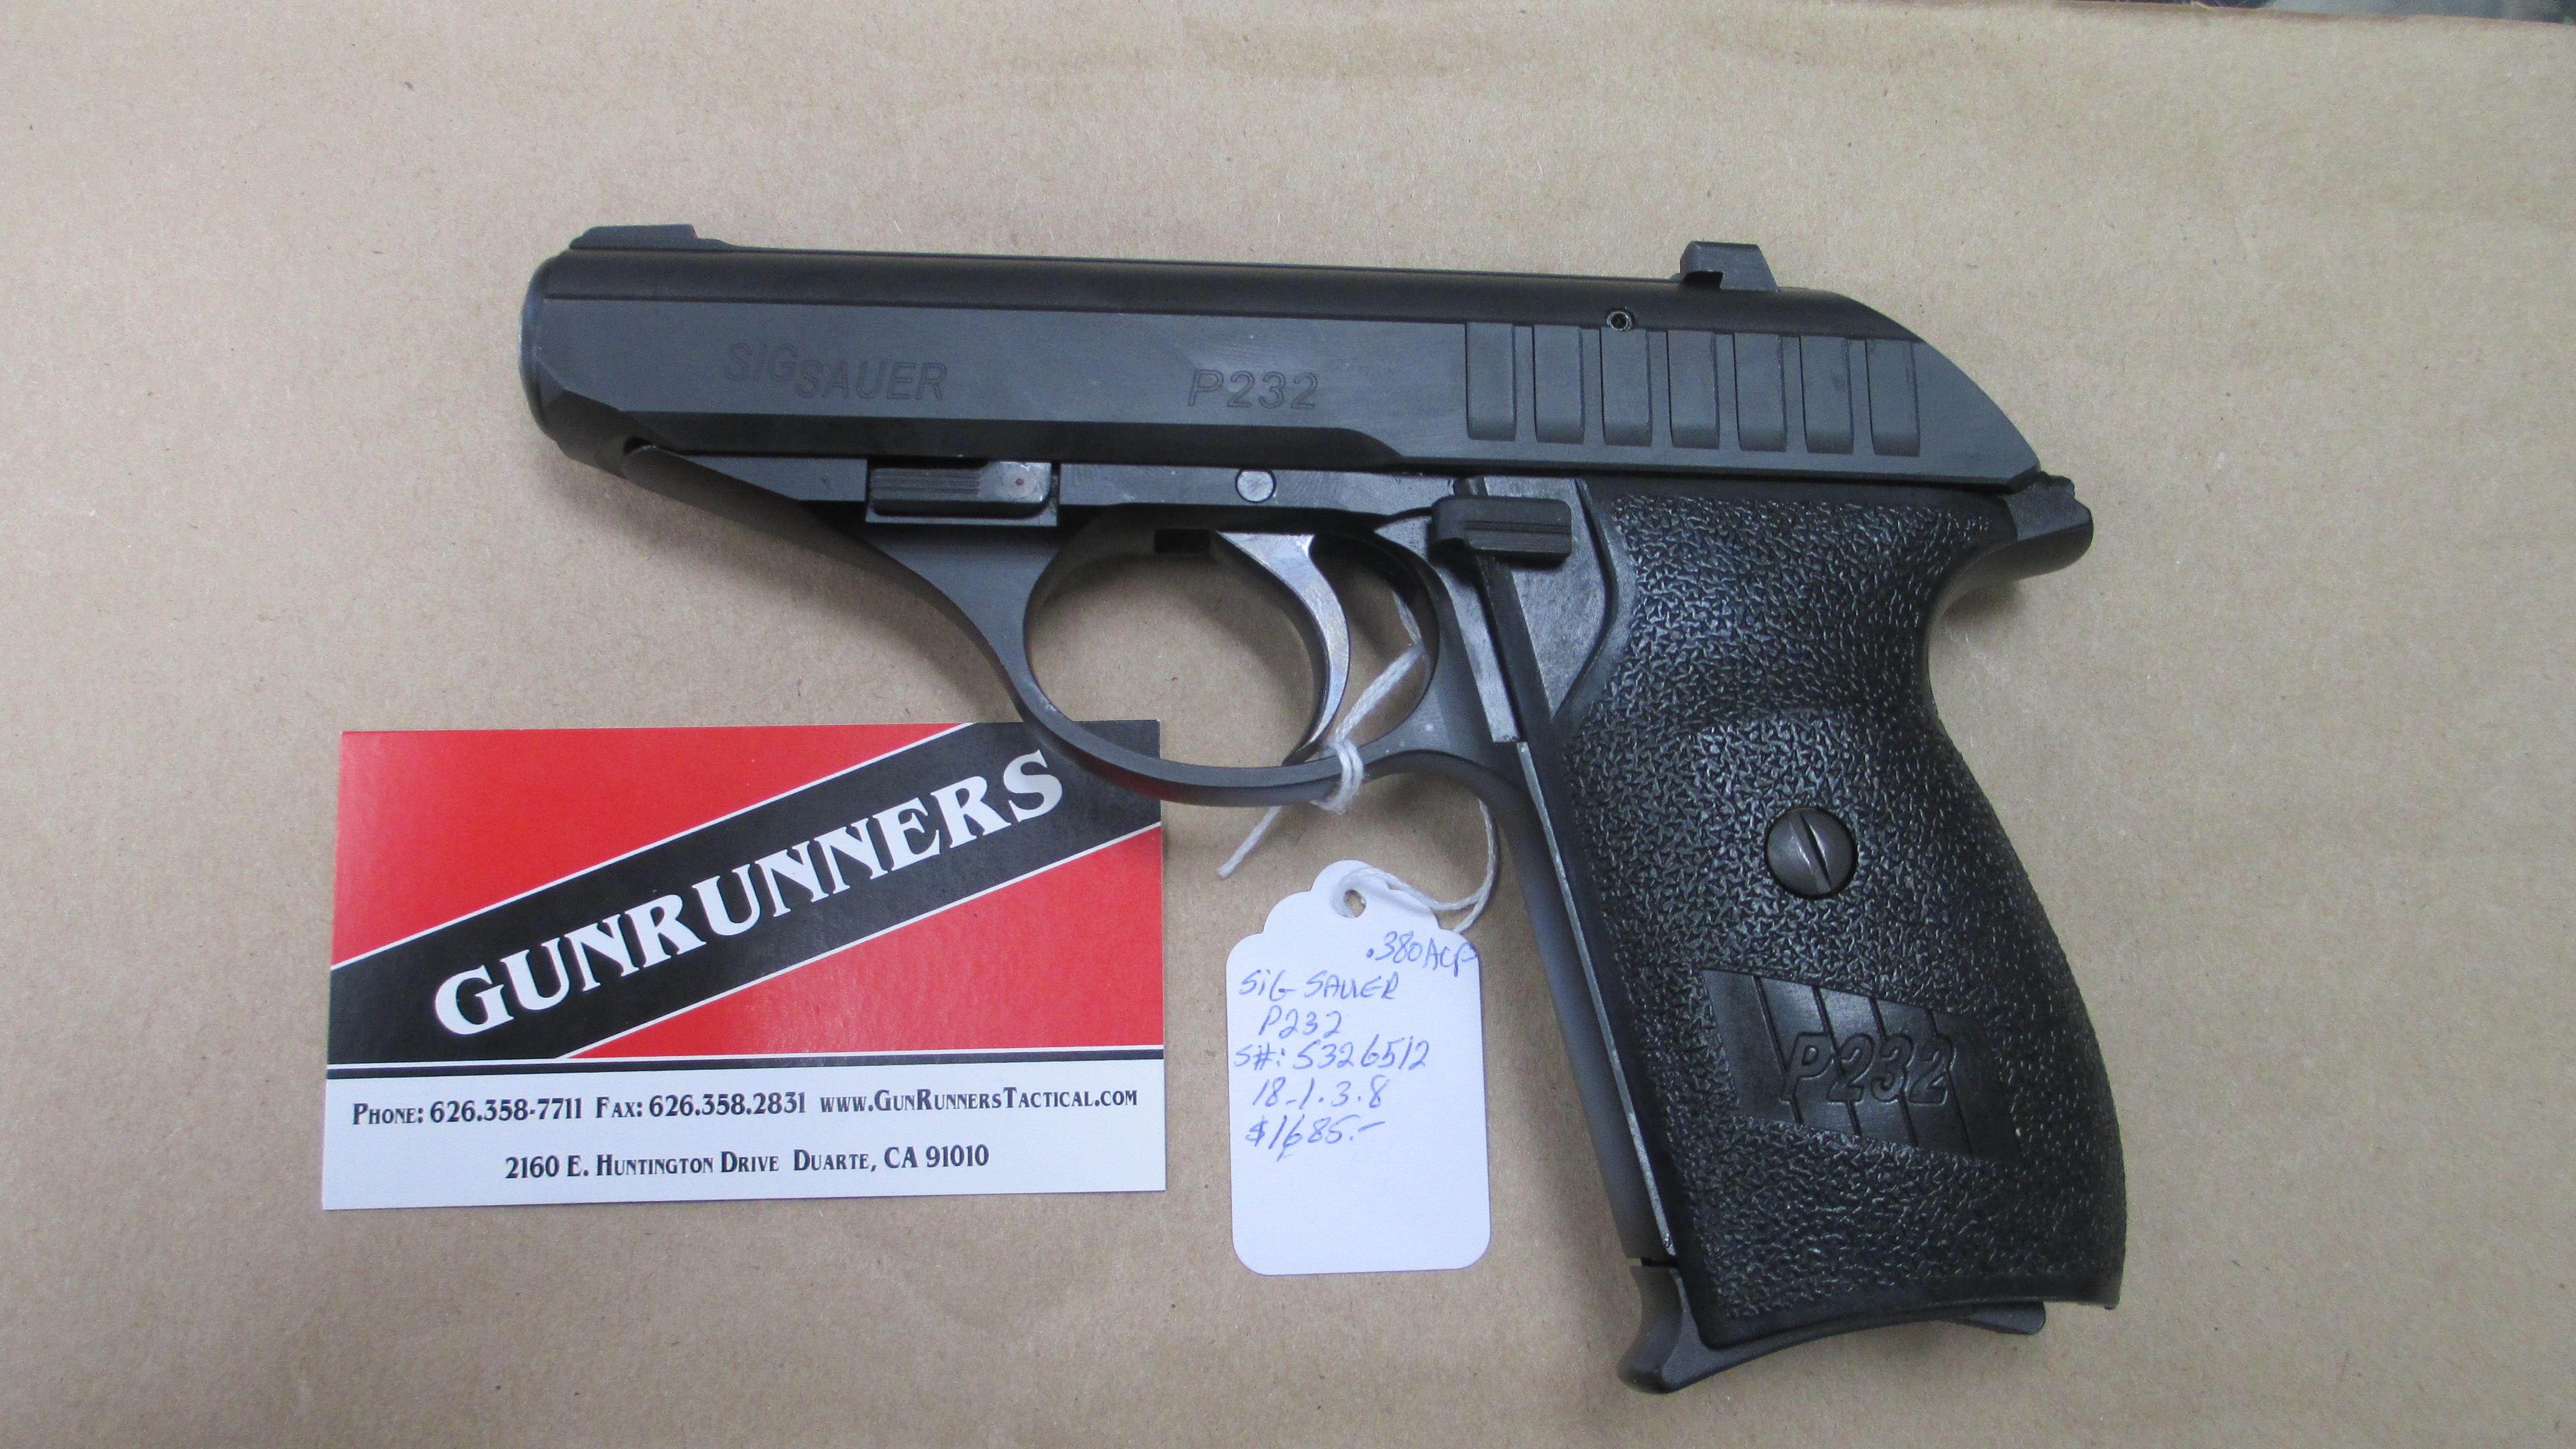 Gunrunnerstactical - Catalog - Pistols